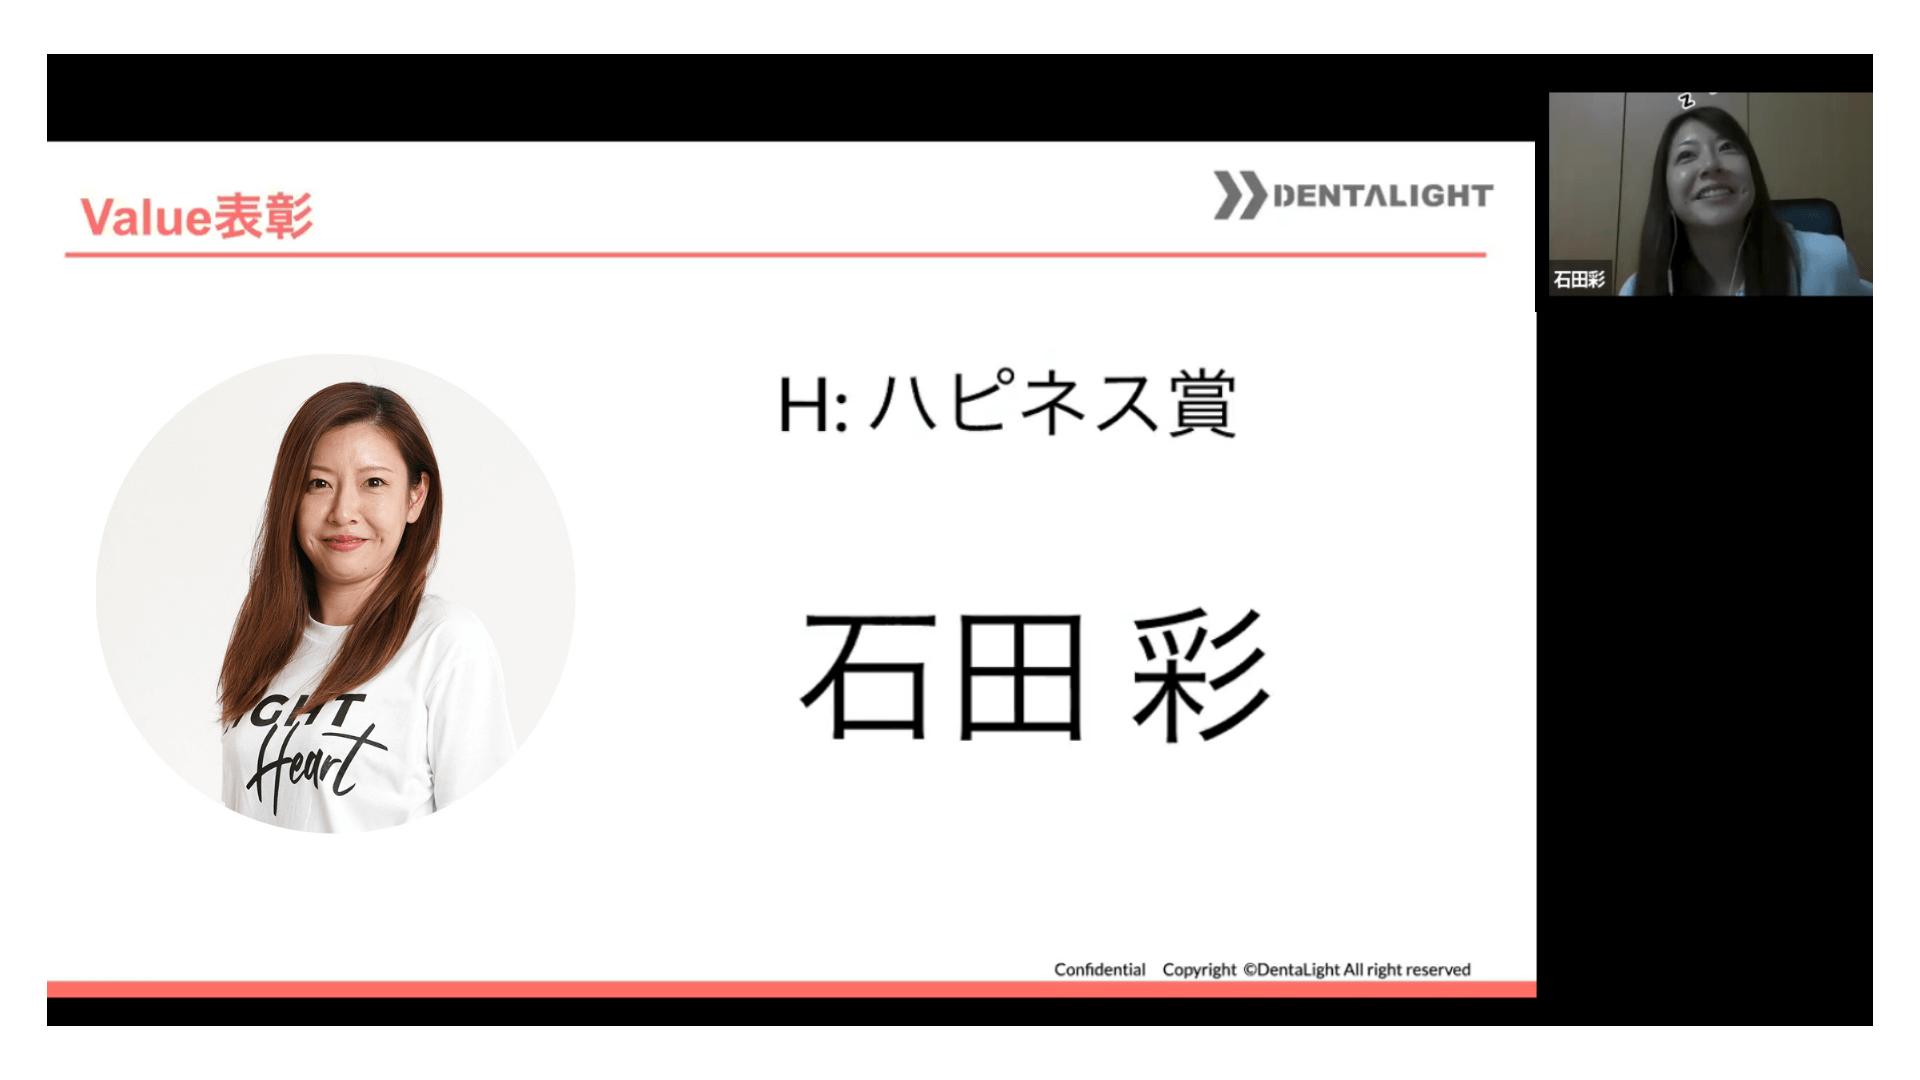 DentaLight デンタライト 社員  石田 彩